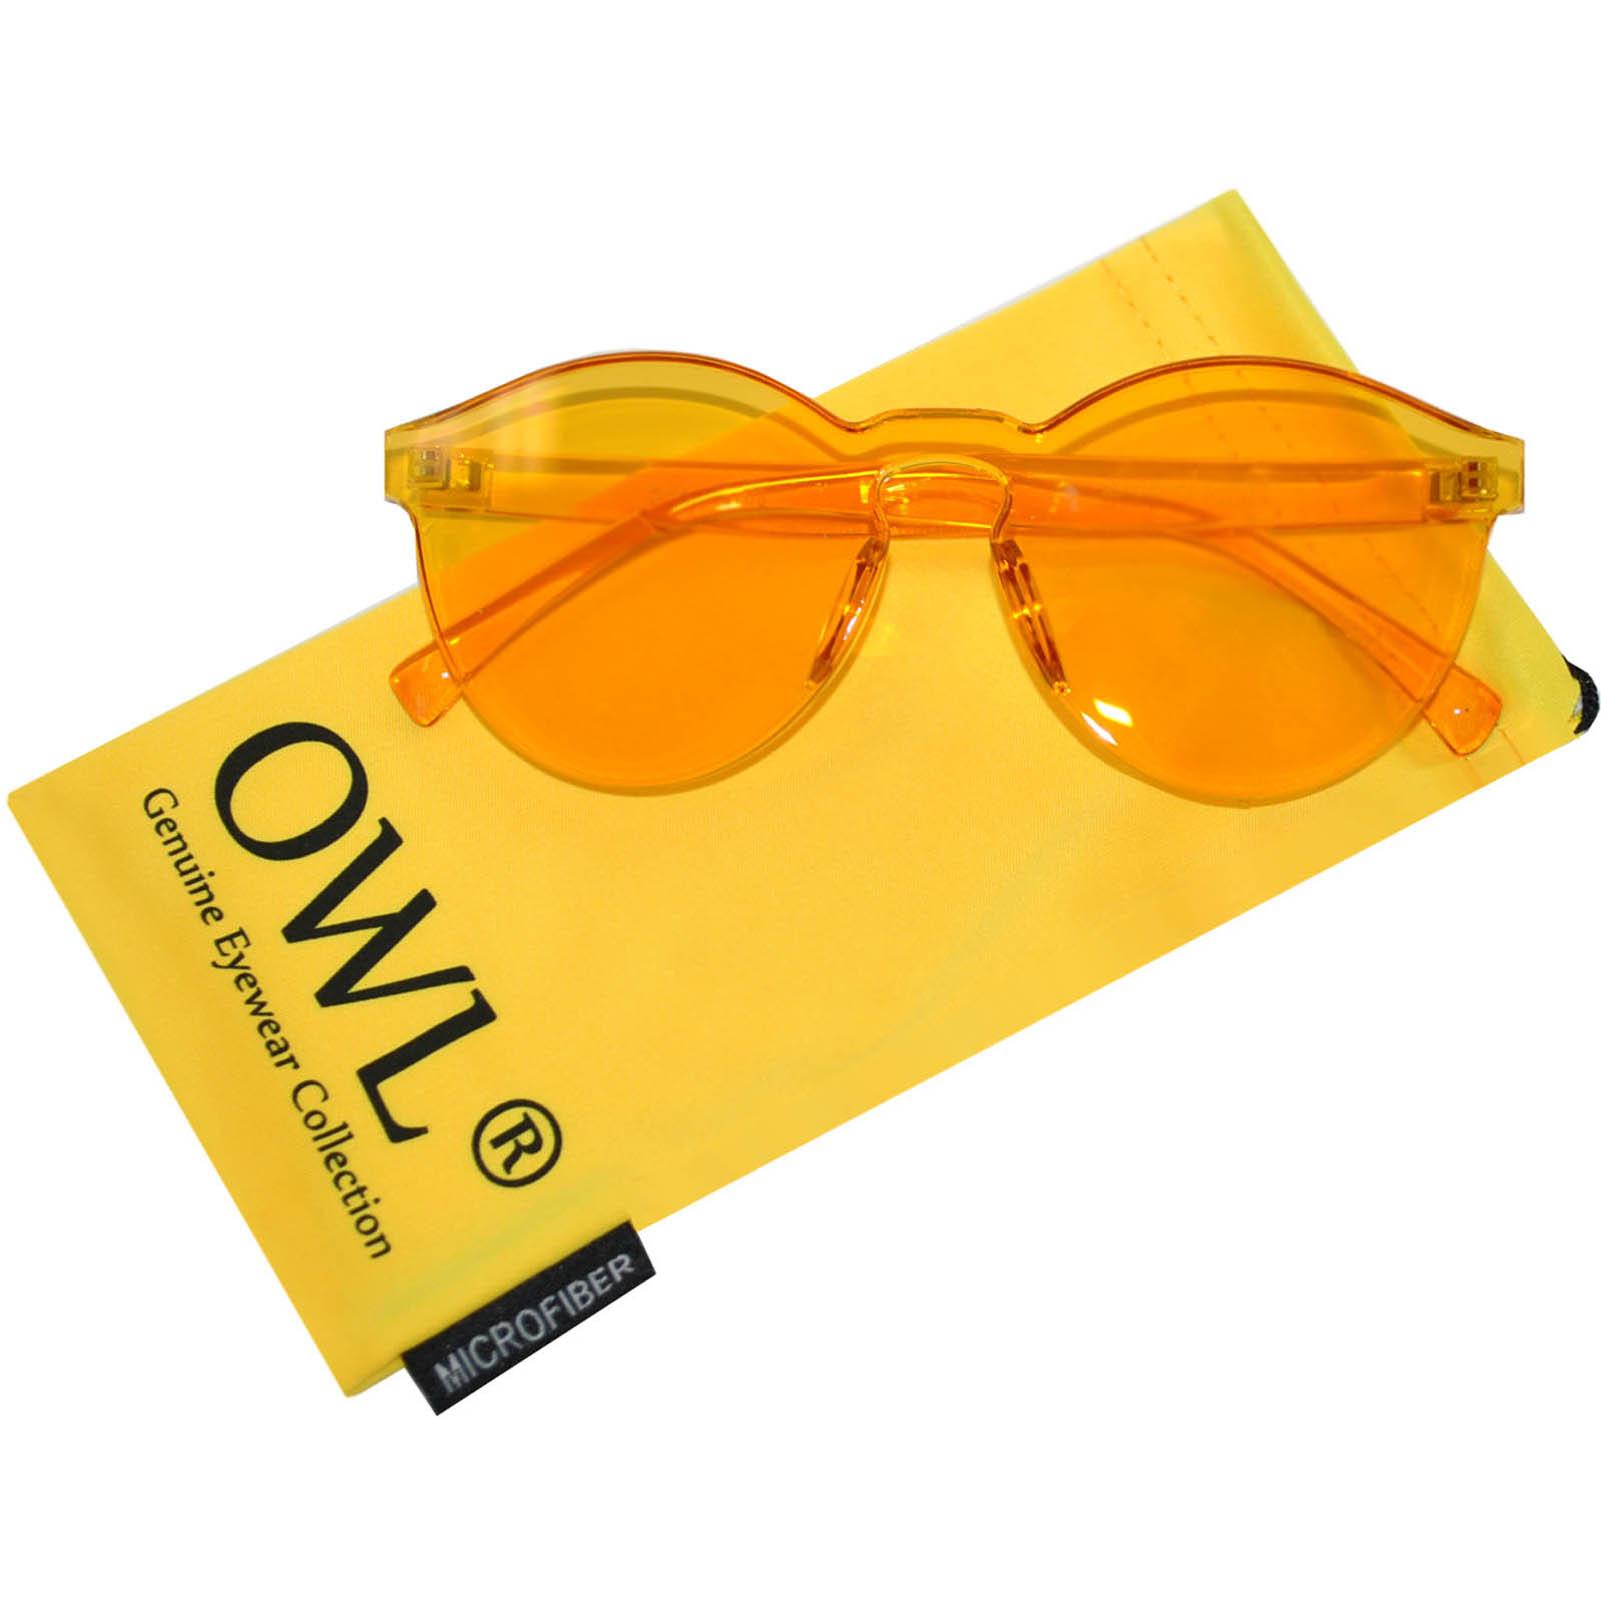 Yellow transparent one peace lens sunglasses